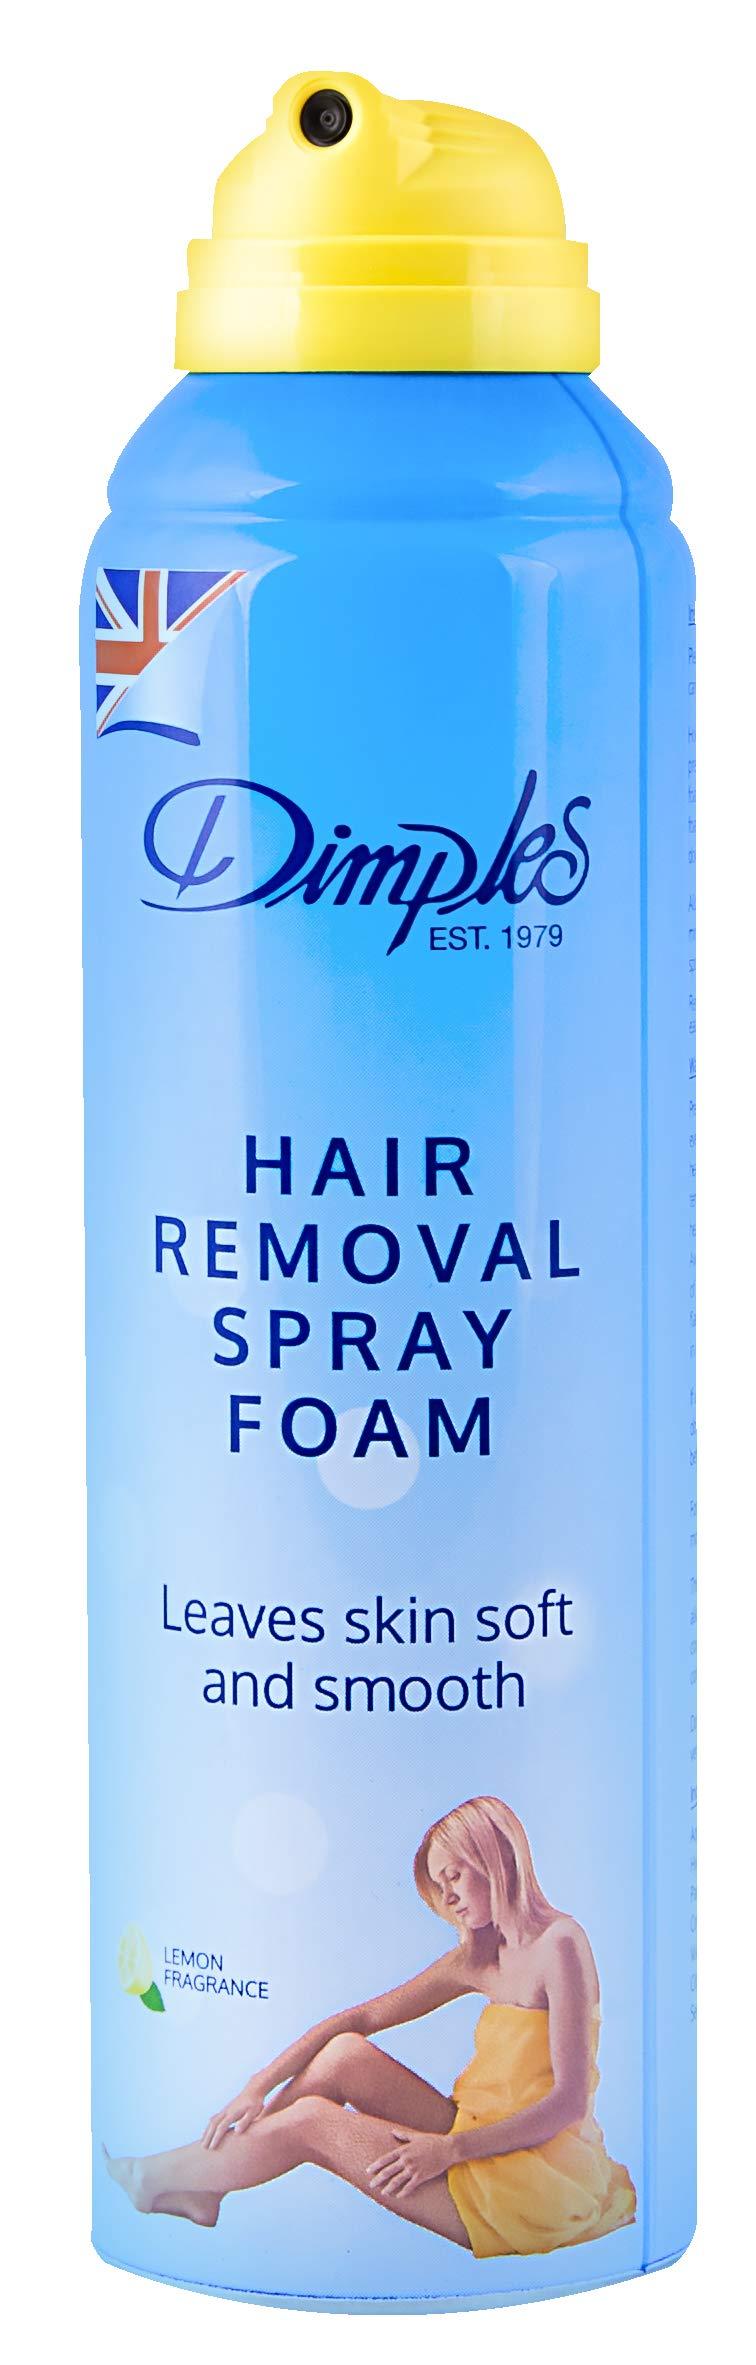 Dimples Hair Removal Spray Foam Lemon Fragrance 200 Ml Buy